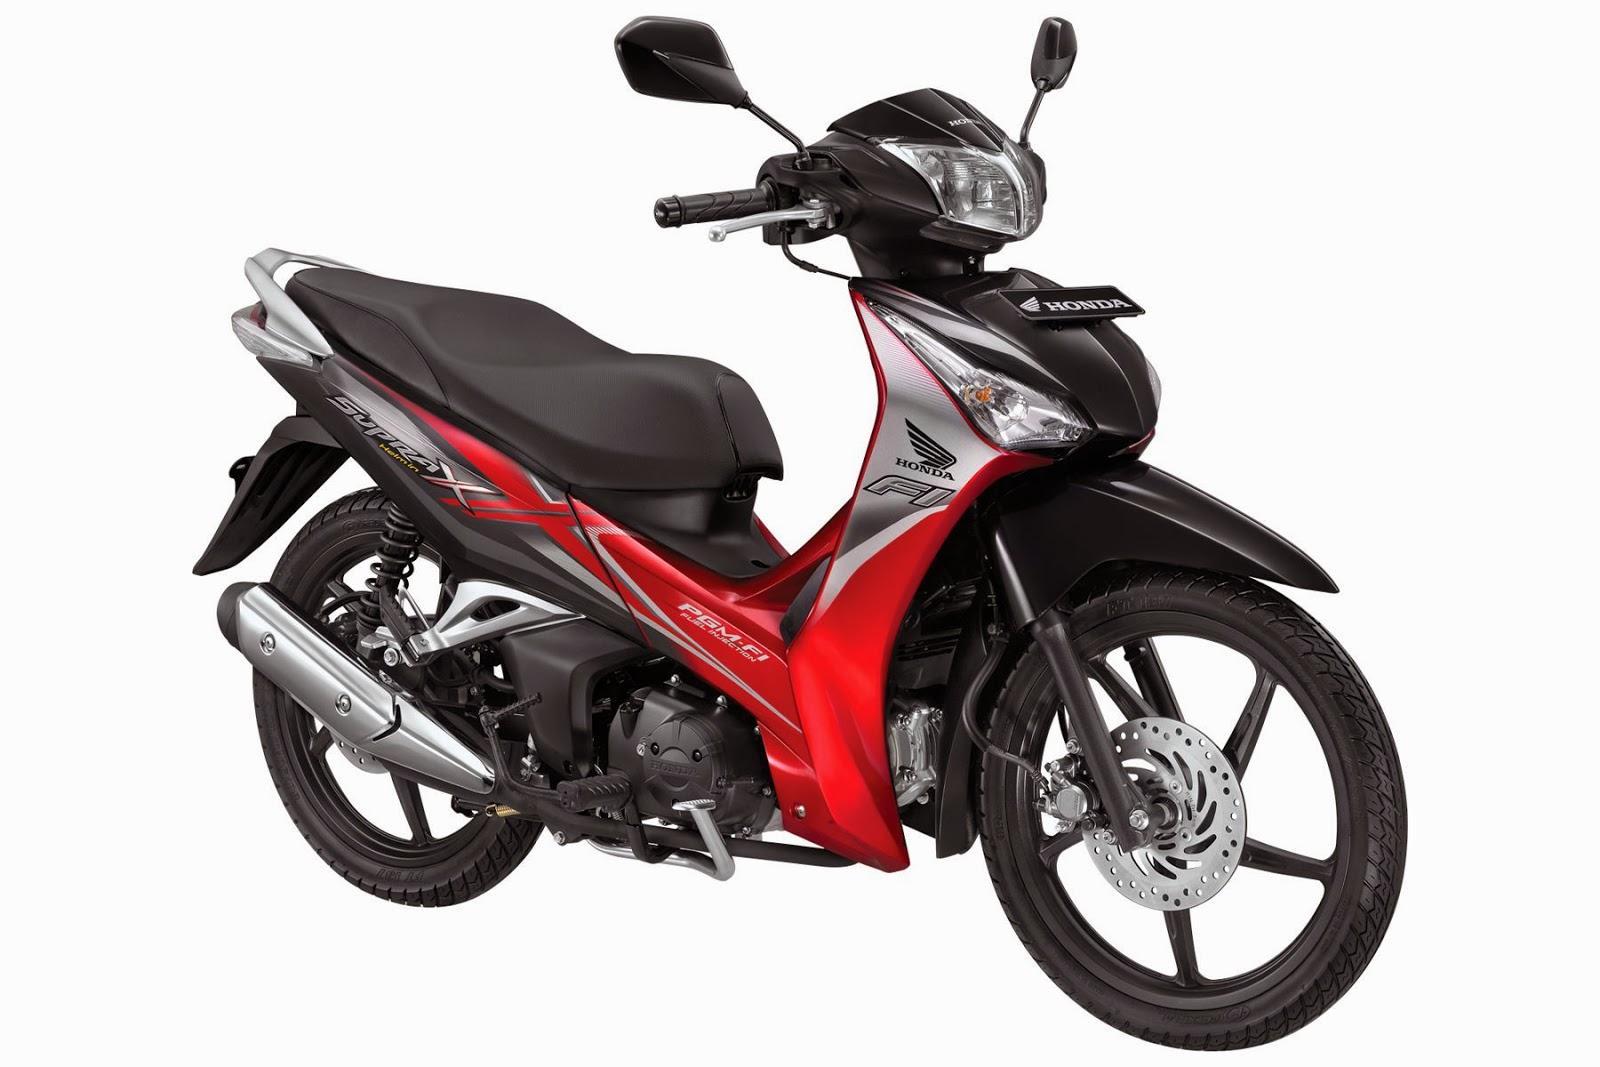 Supra X 125cc Vs Shogun 125cc